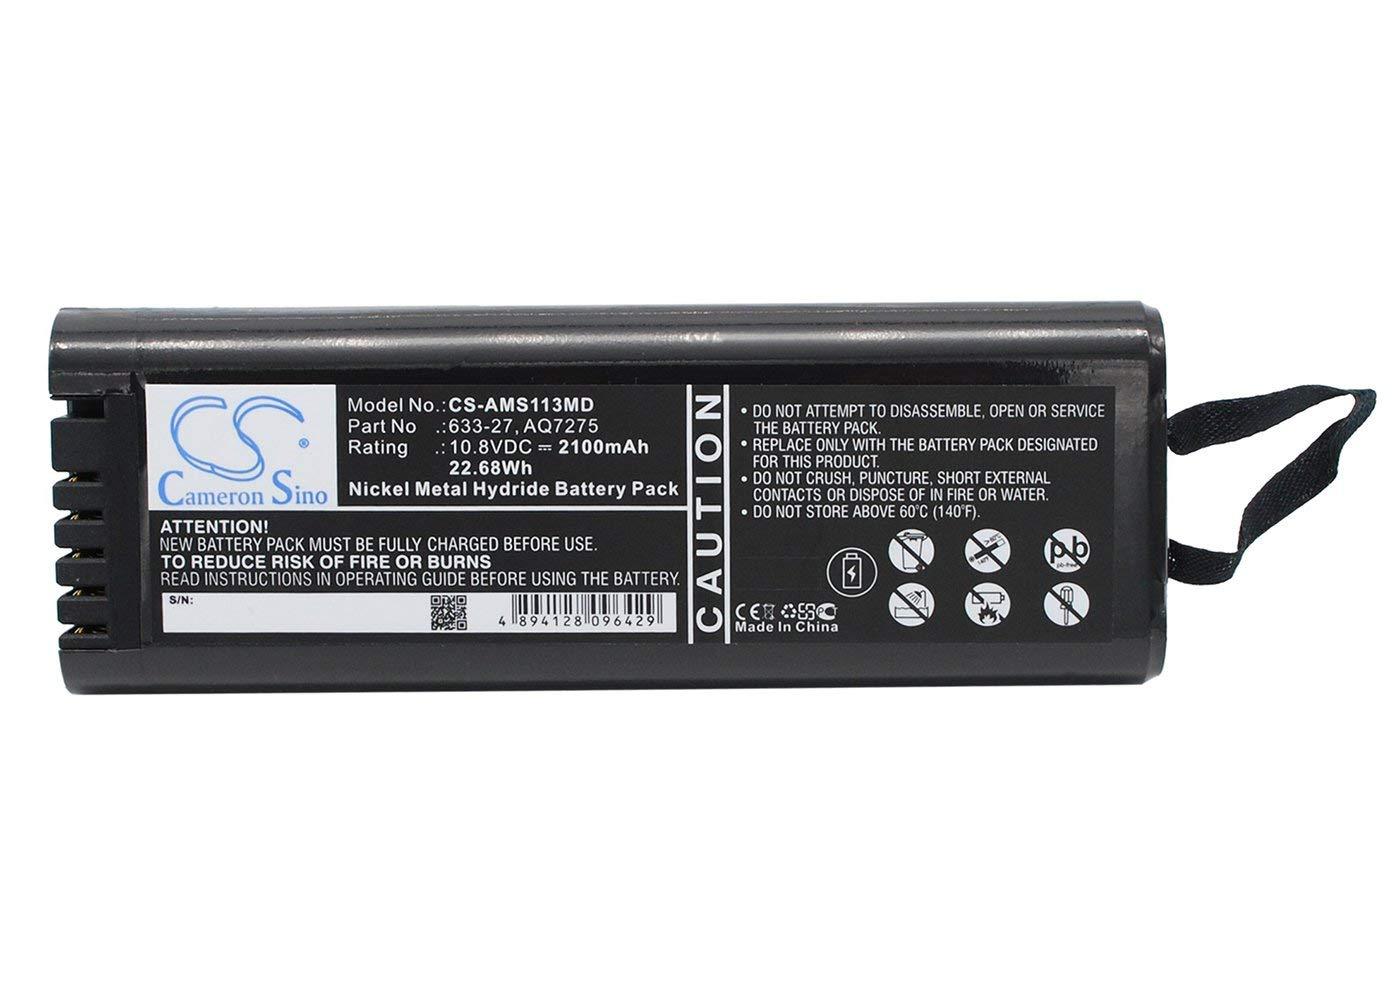 vintrons Replacement Battery for ANRITSU 633-27, YOKOGAWA AQ7275 by VI VINTRONS